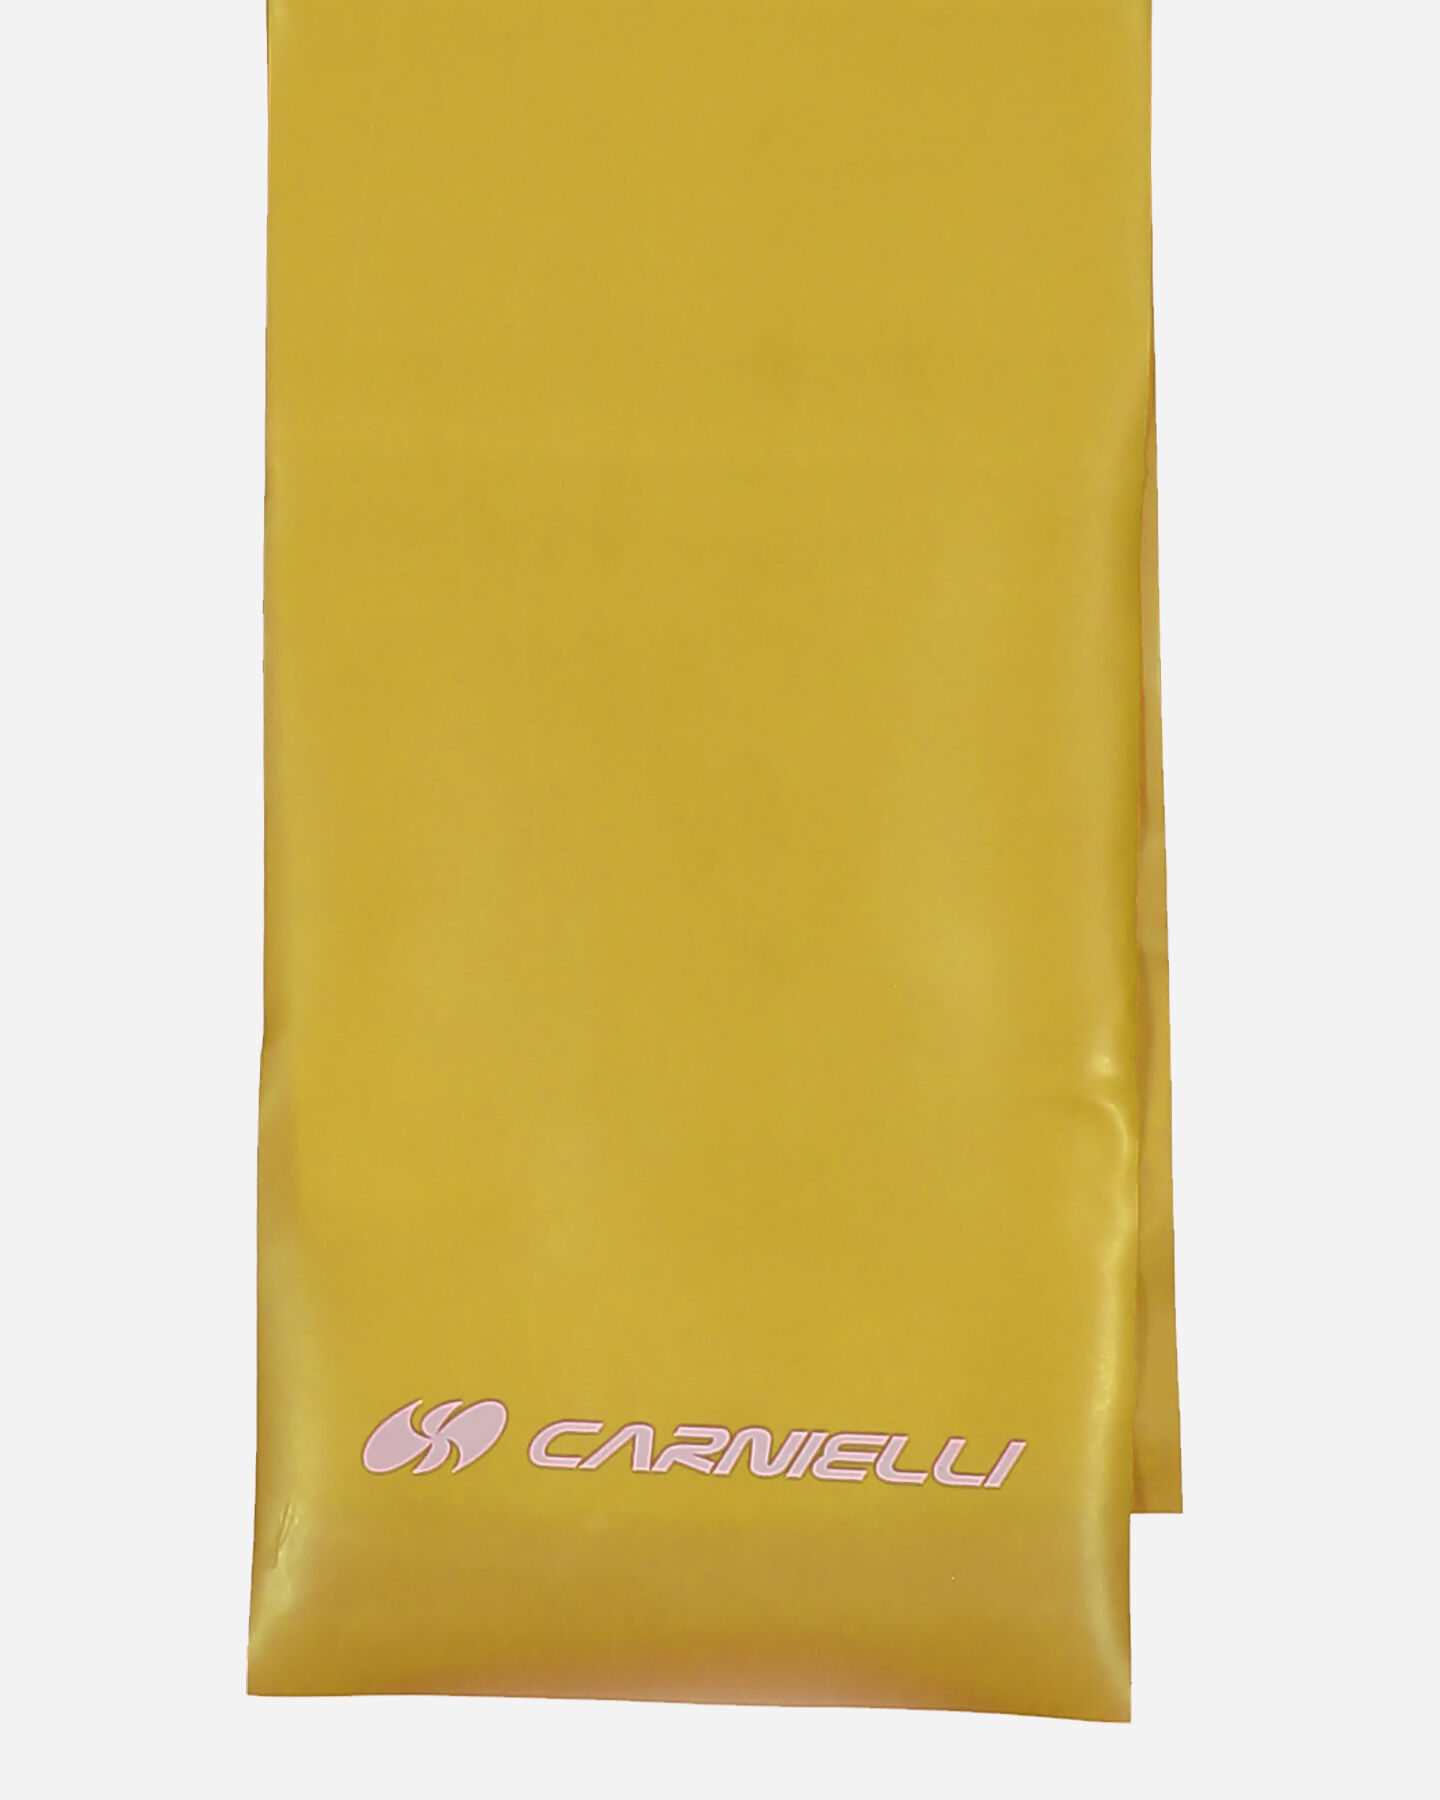 Banda elastica CARNIELLI BANDA ELASTICA 175 CM S1326883 1 UNI scatto 1